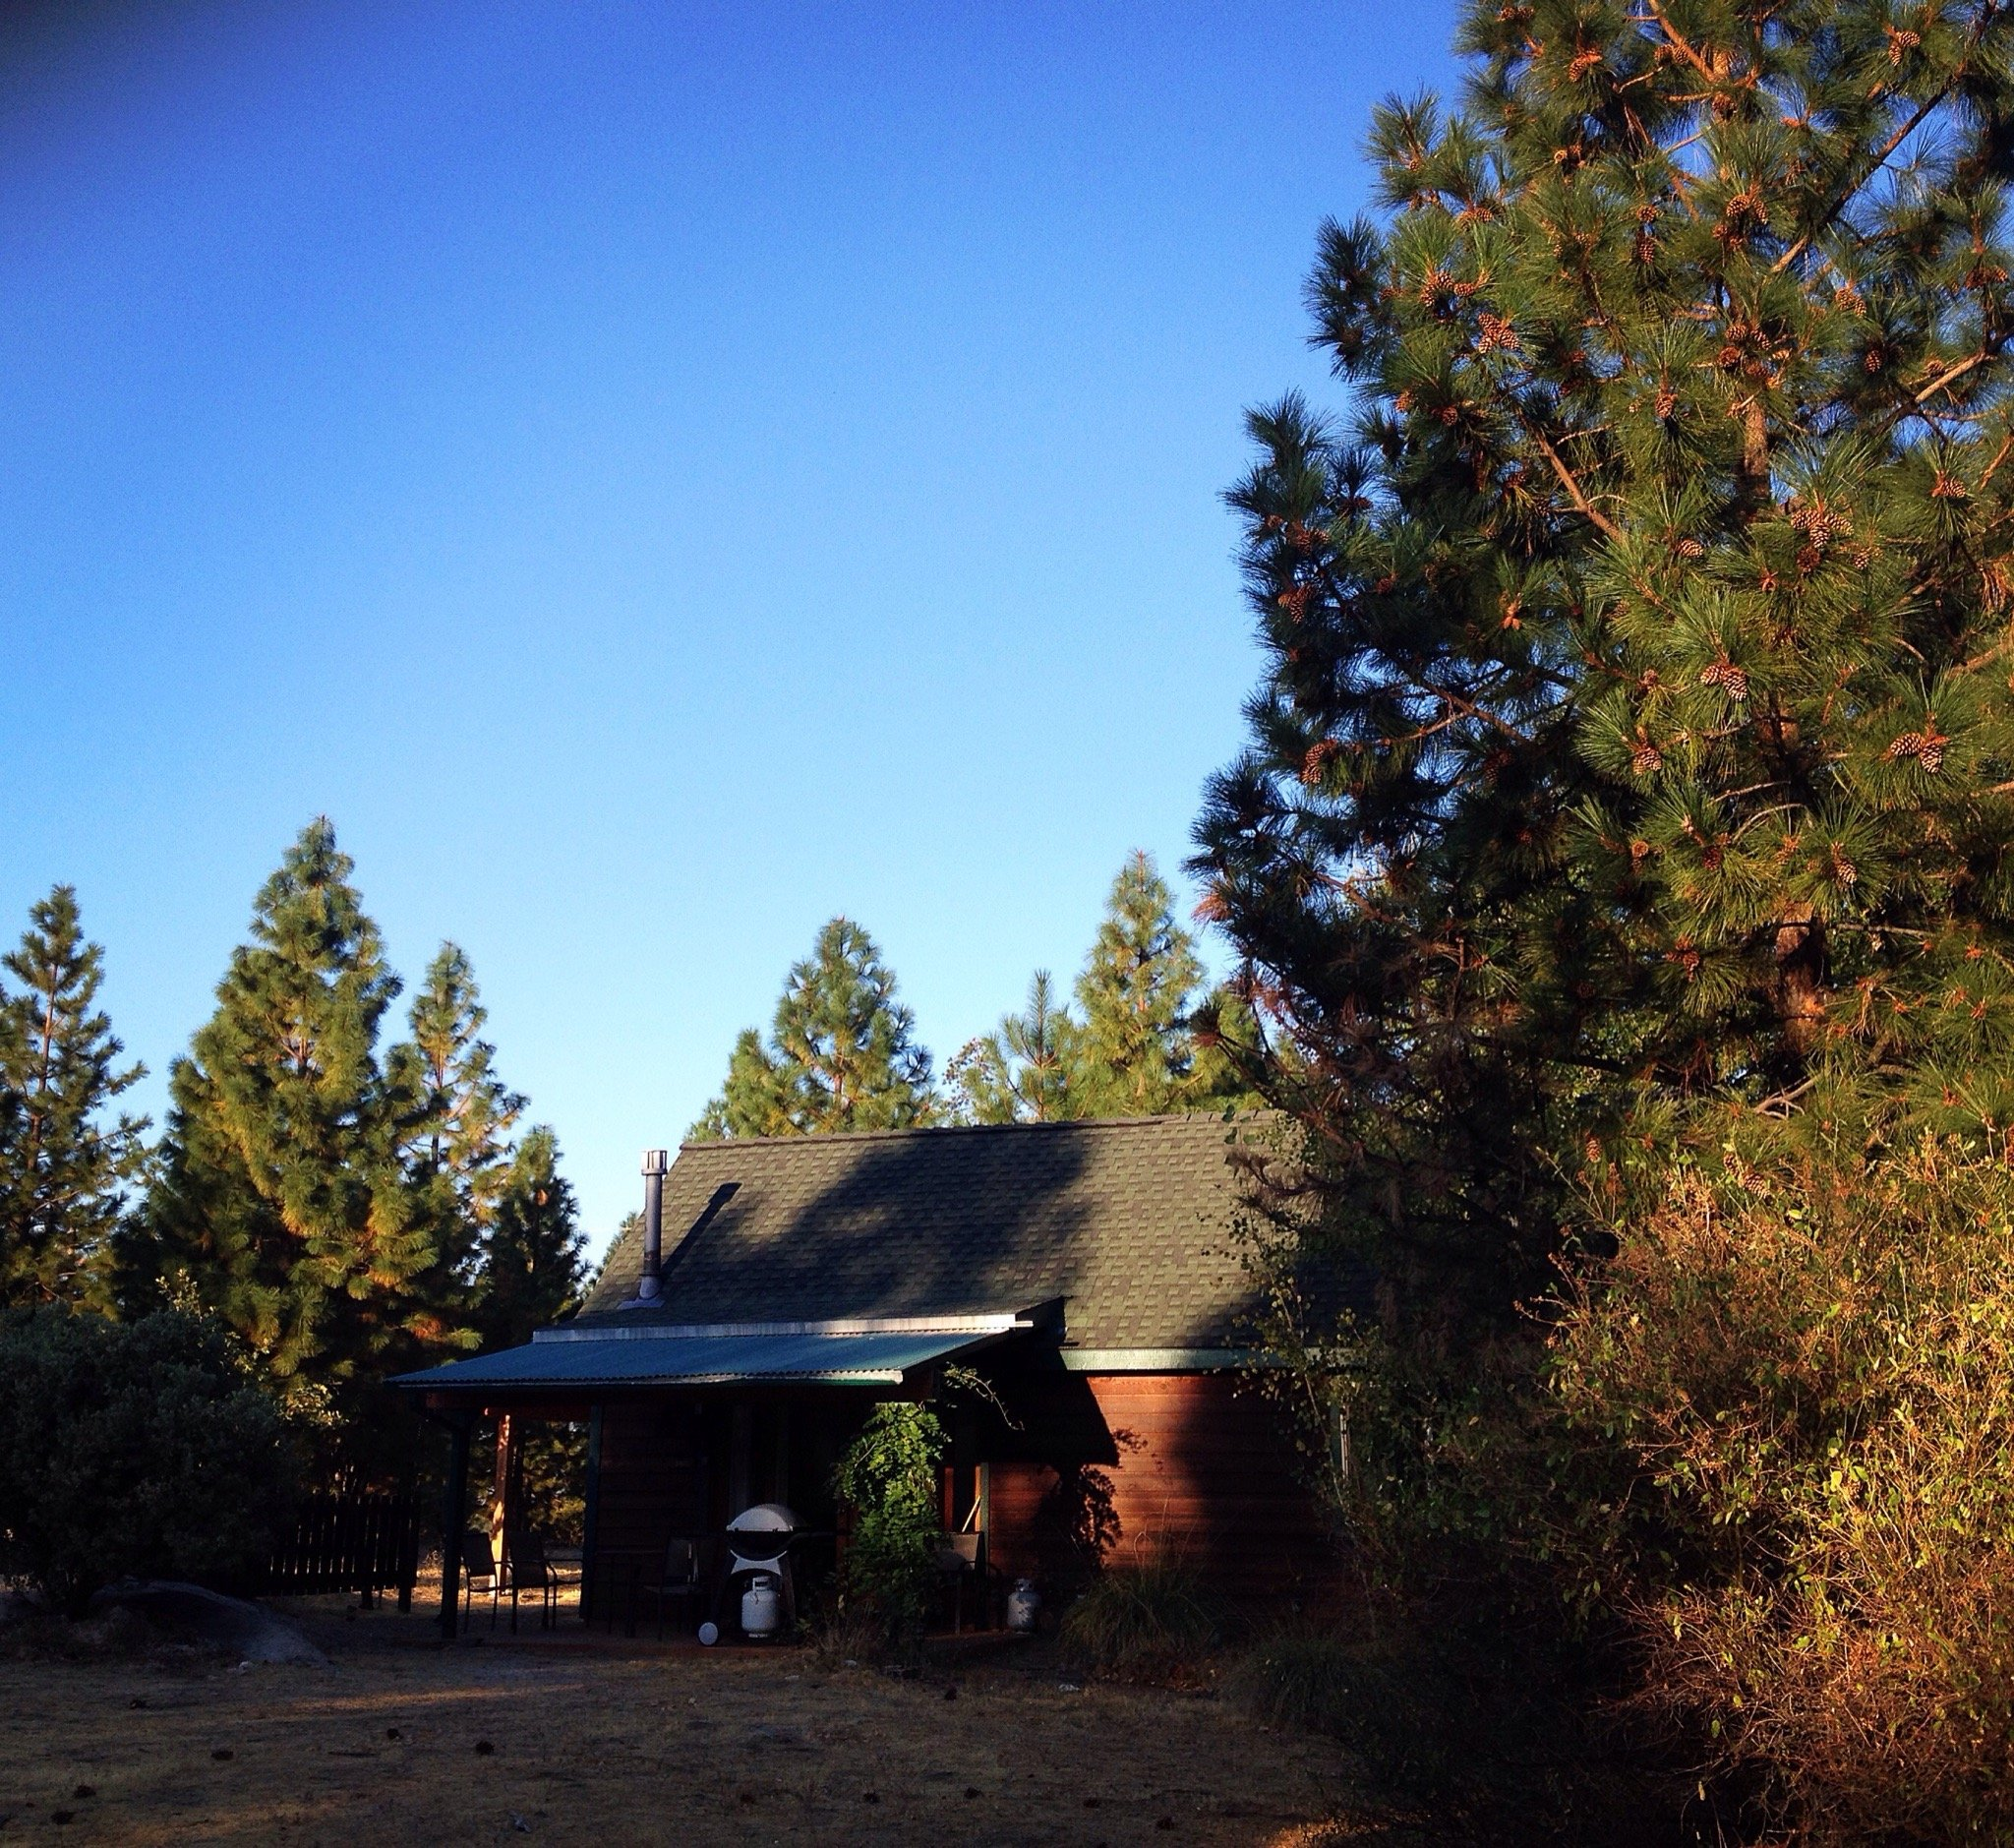 Yosemite Hilltop Cabins